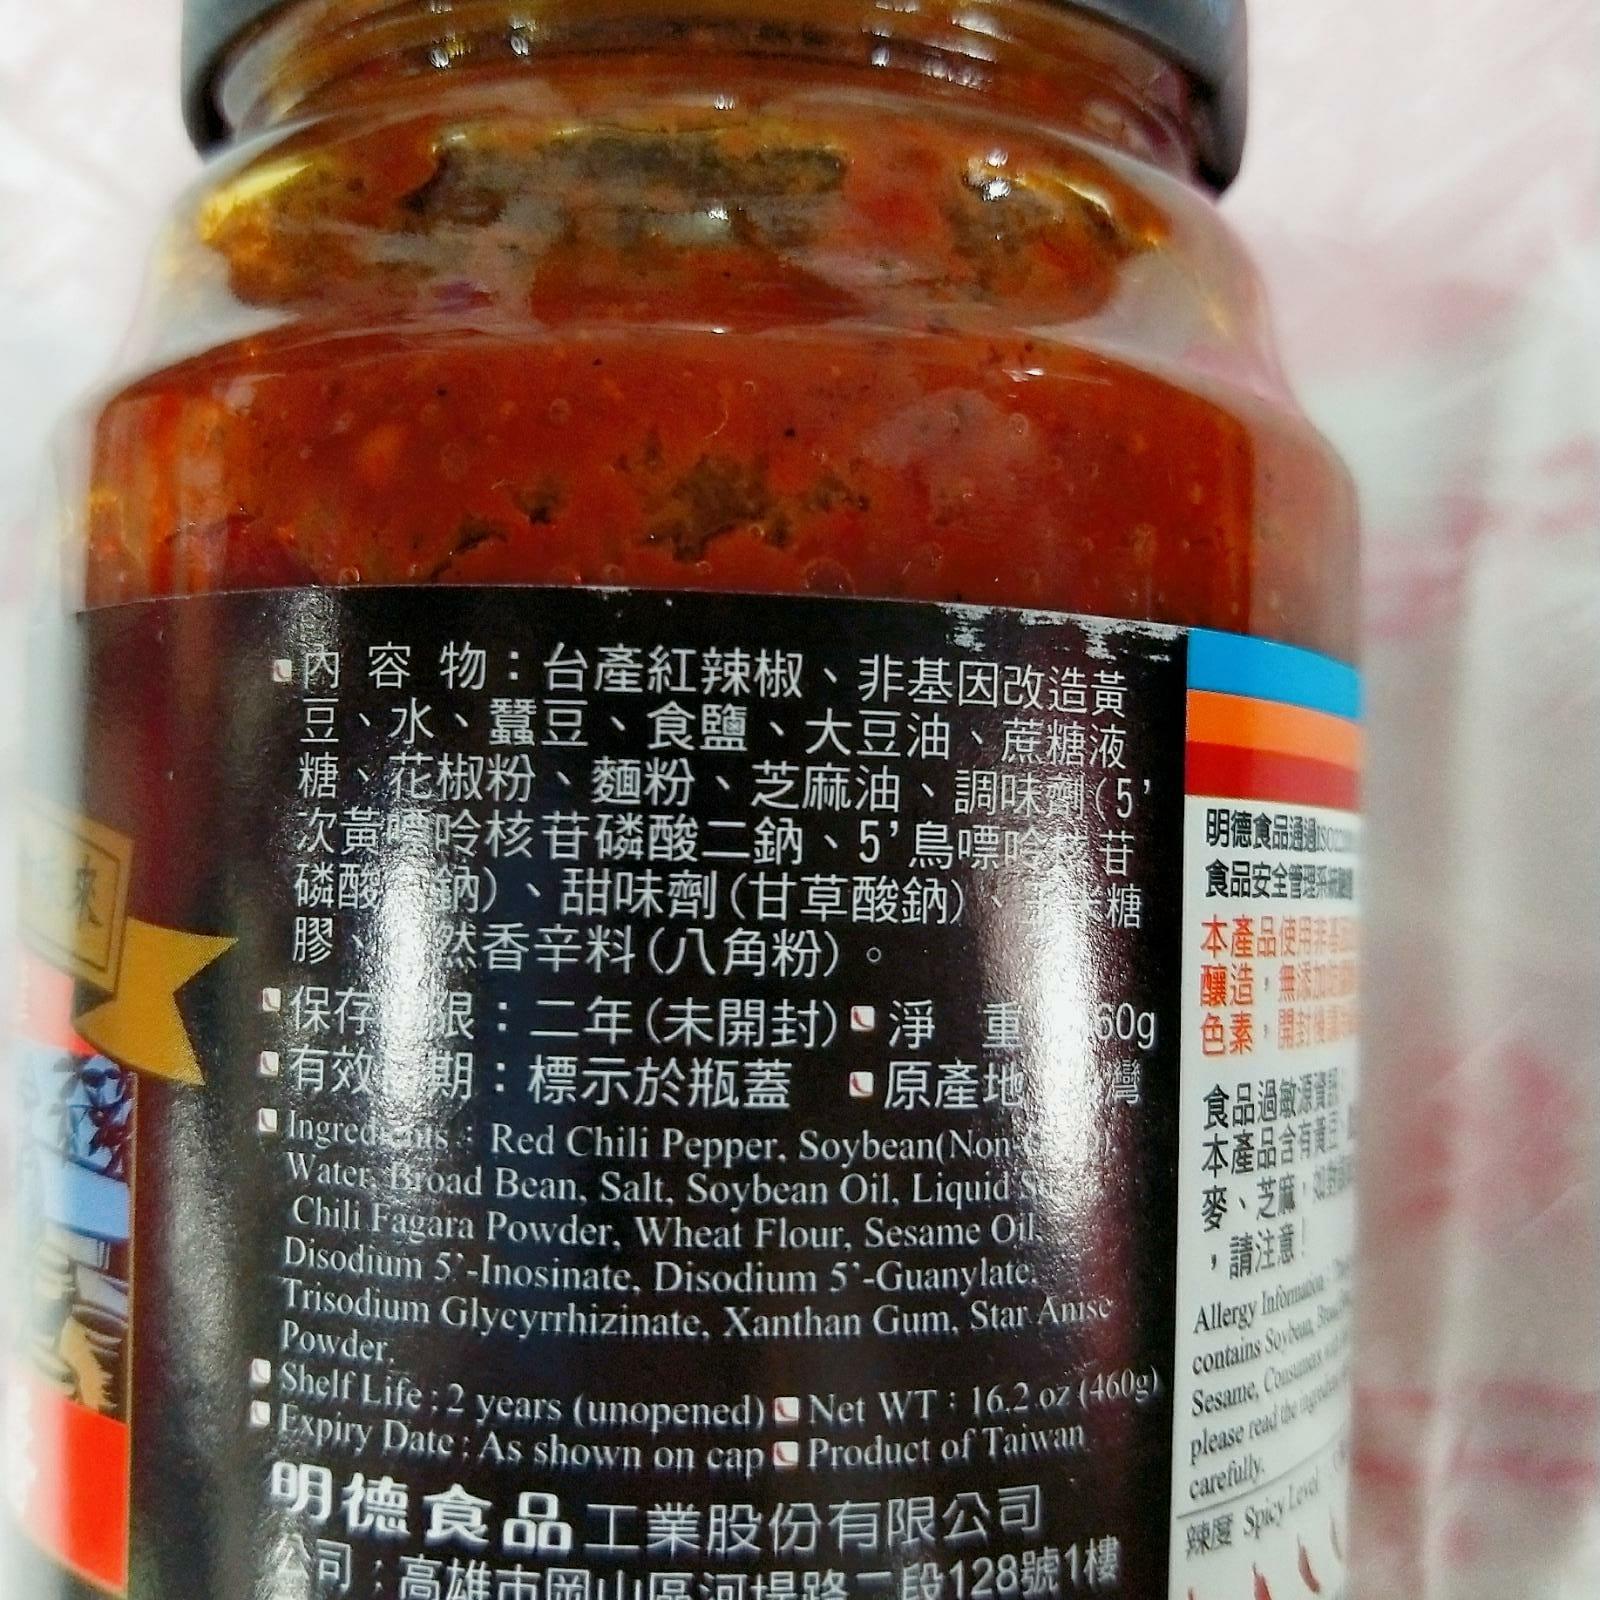 Image MALA Ma La Spicy Sauce 明德 - 麻辣锅底酱 460grams